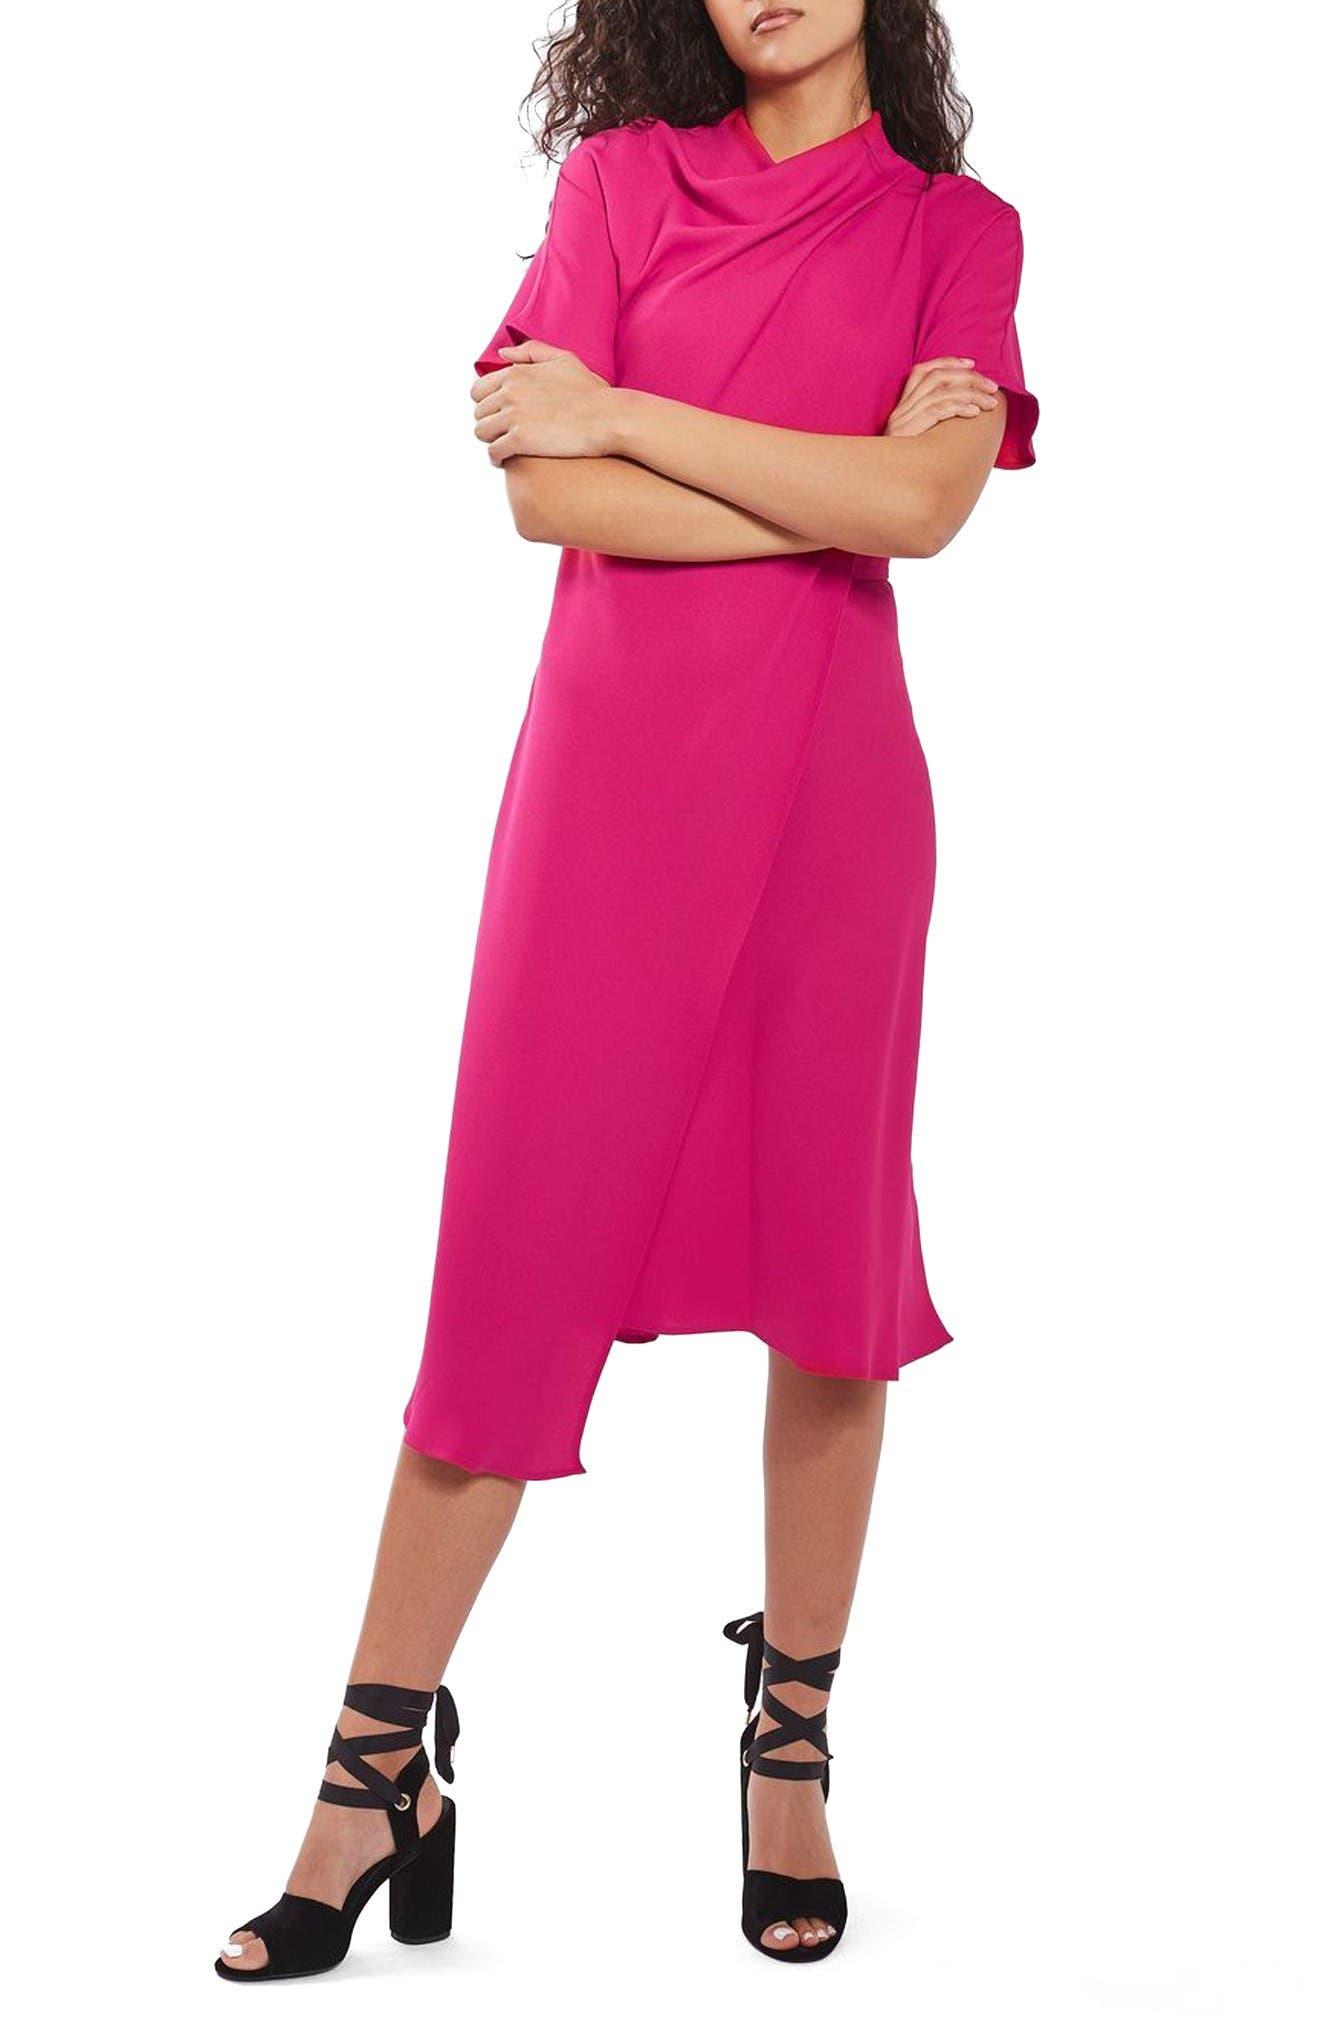 Alternate Image 1 Selected - Topshop Origami Drape Neck Midi Dress